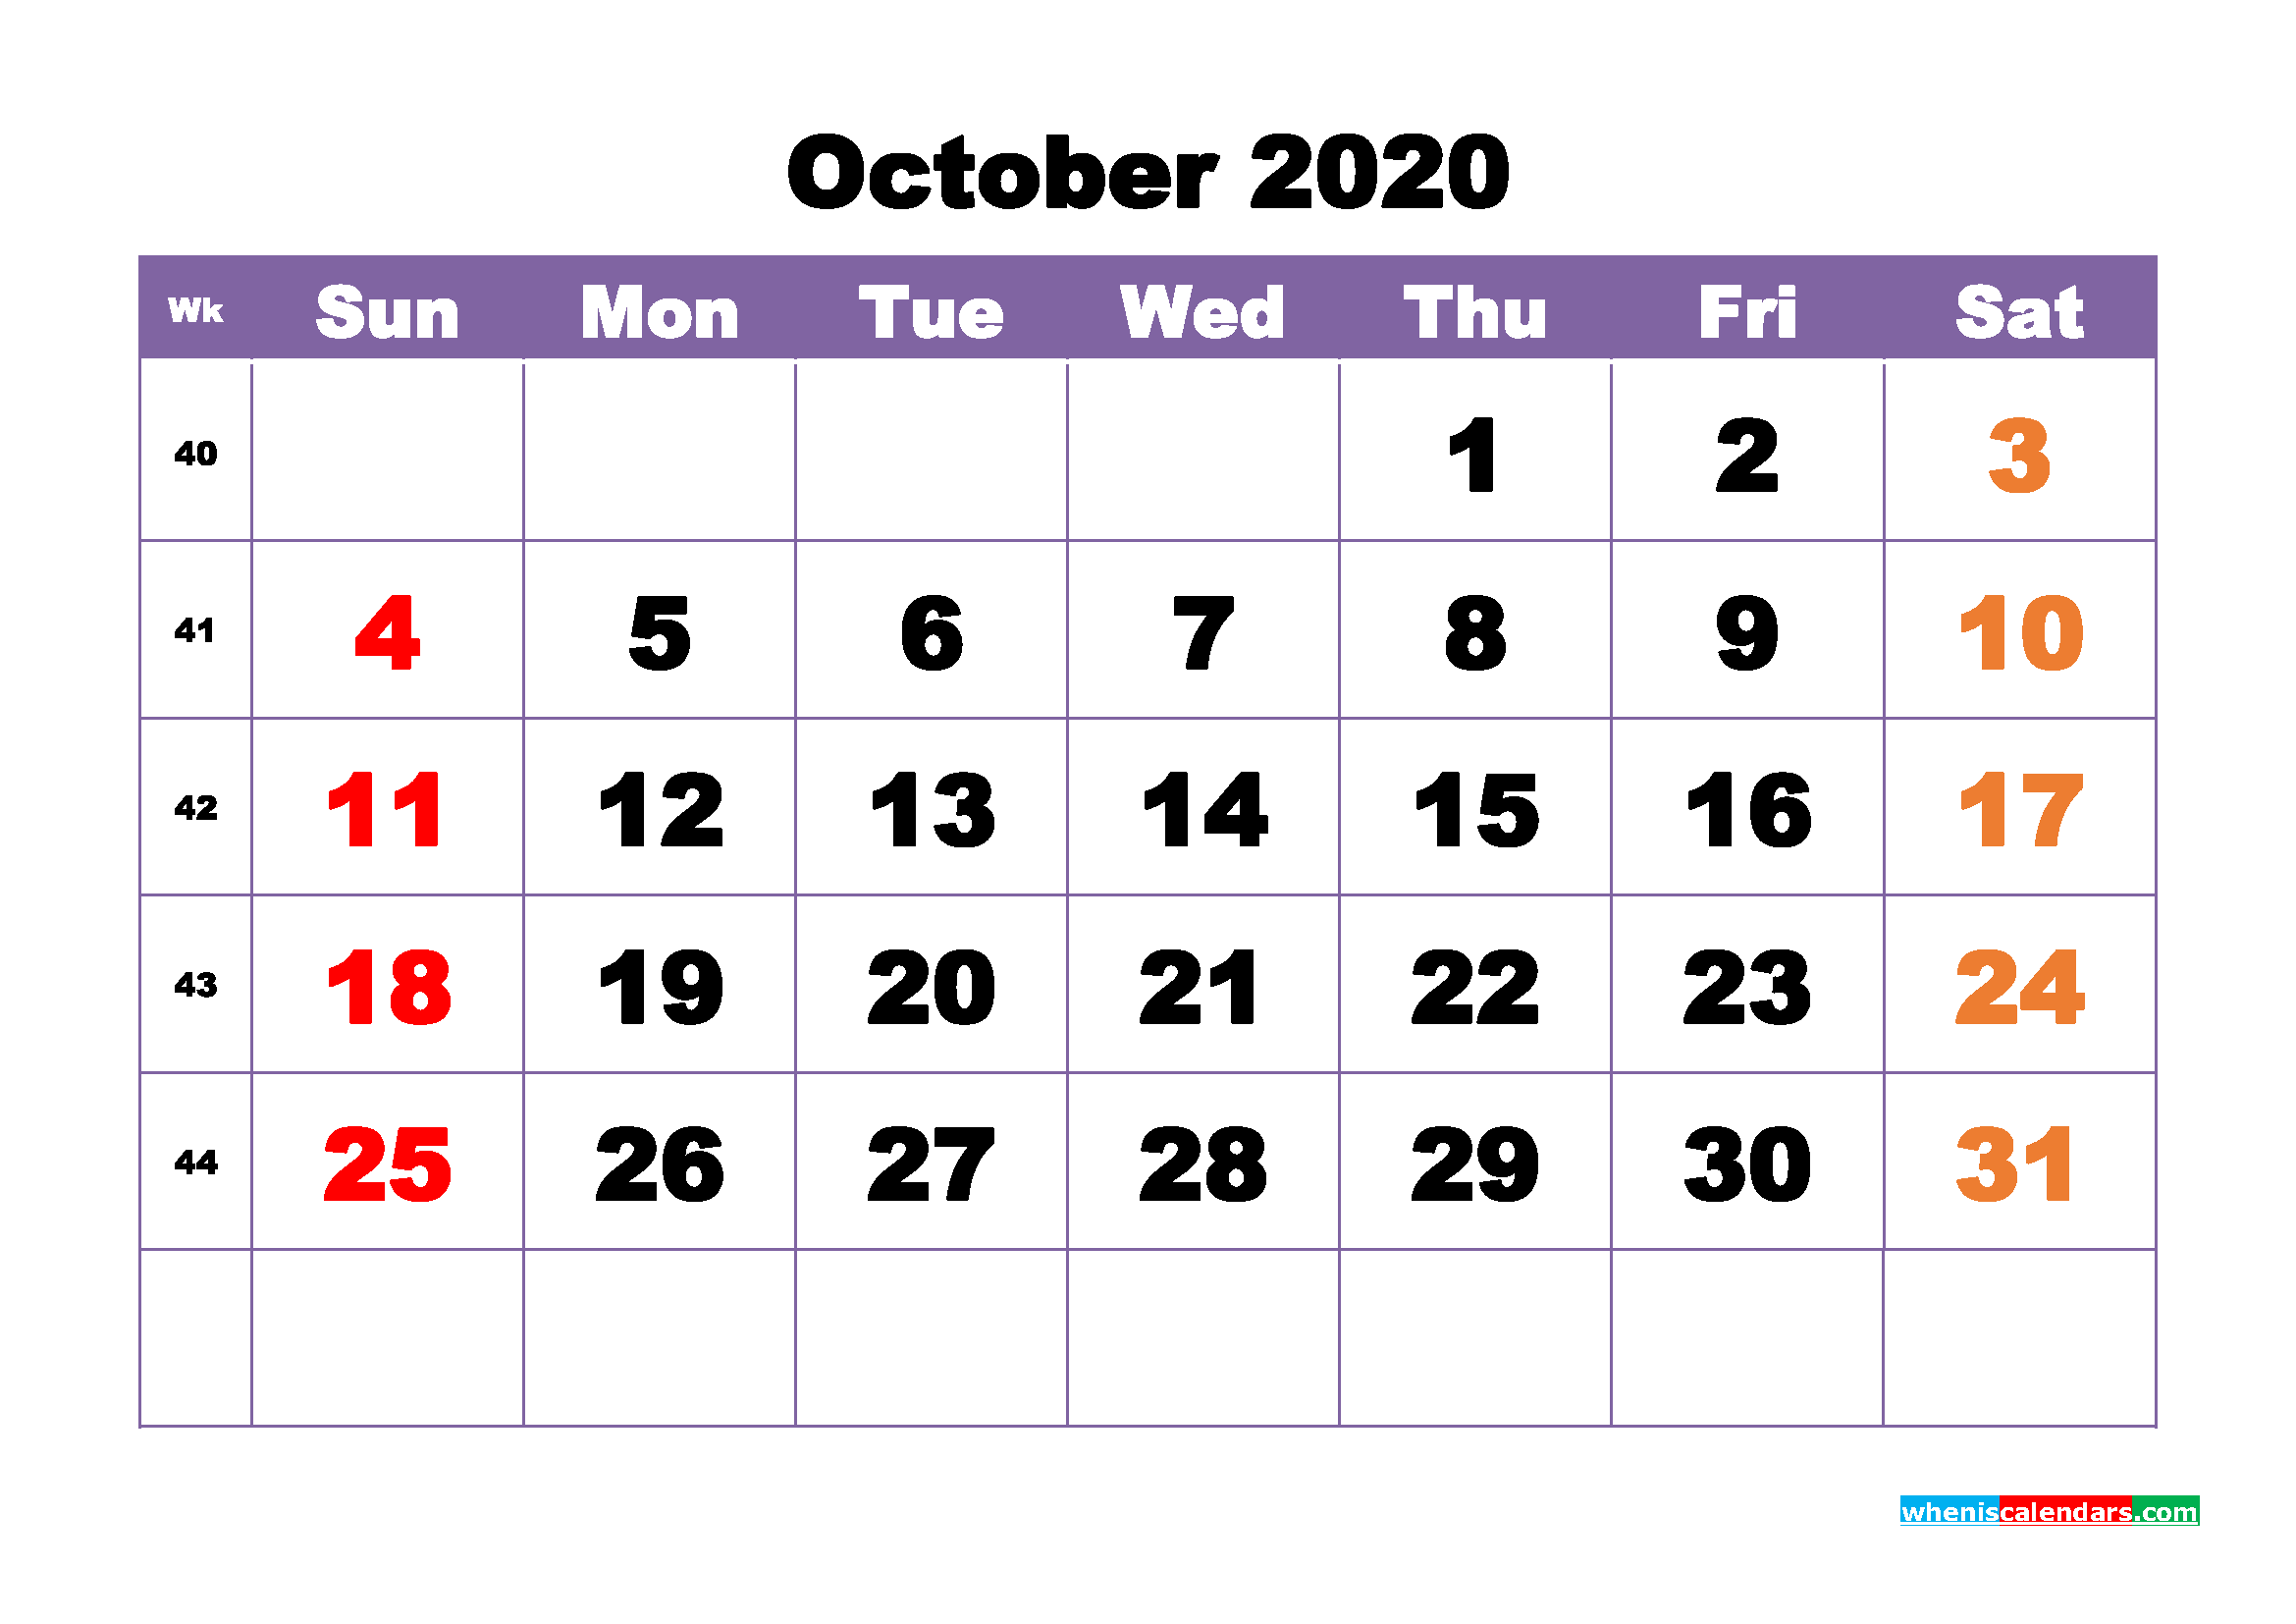 Free Printable October 2020 Calendar - No.m20b394